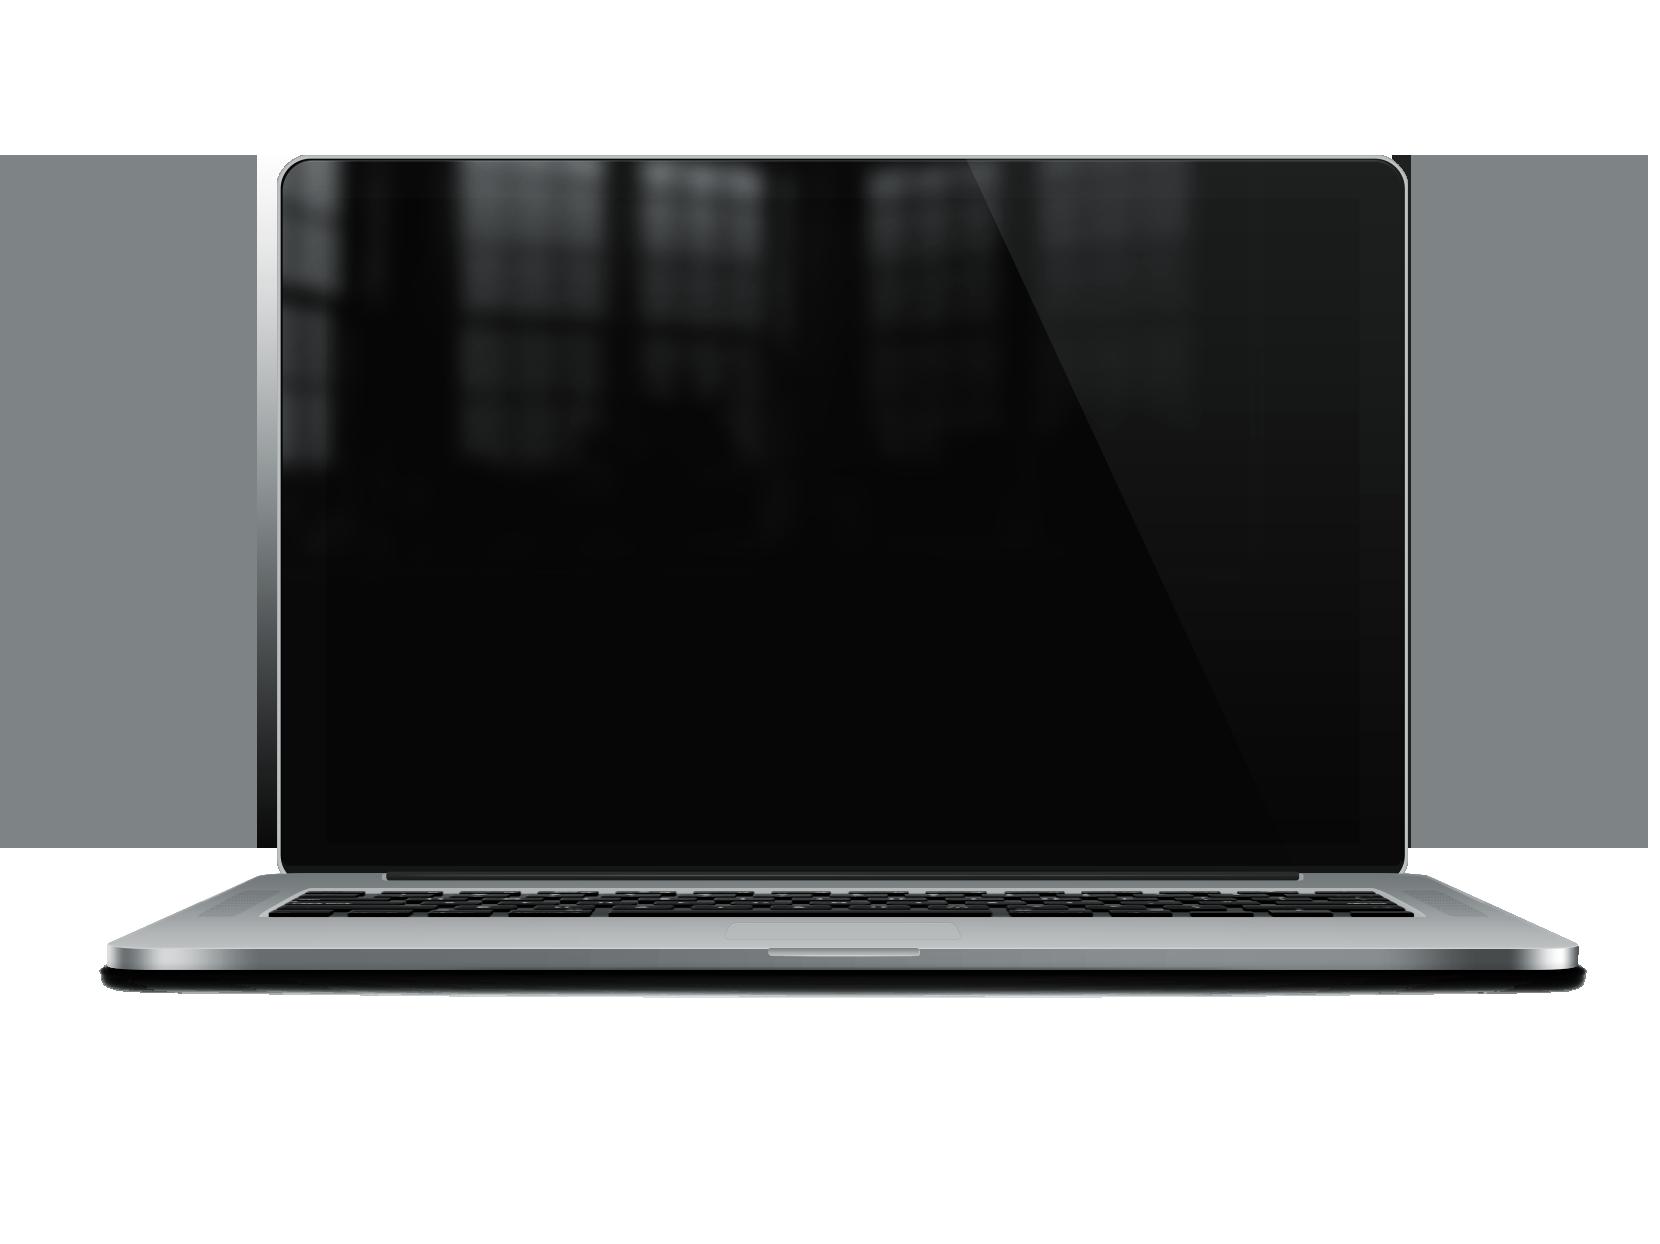 Glossy-Macbook-Pro-Retina-Mockup-PSD